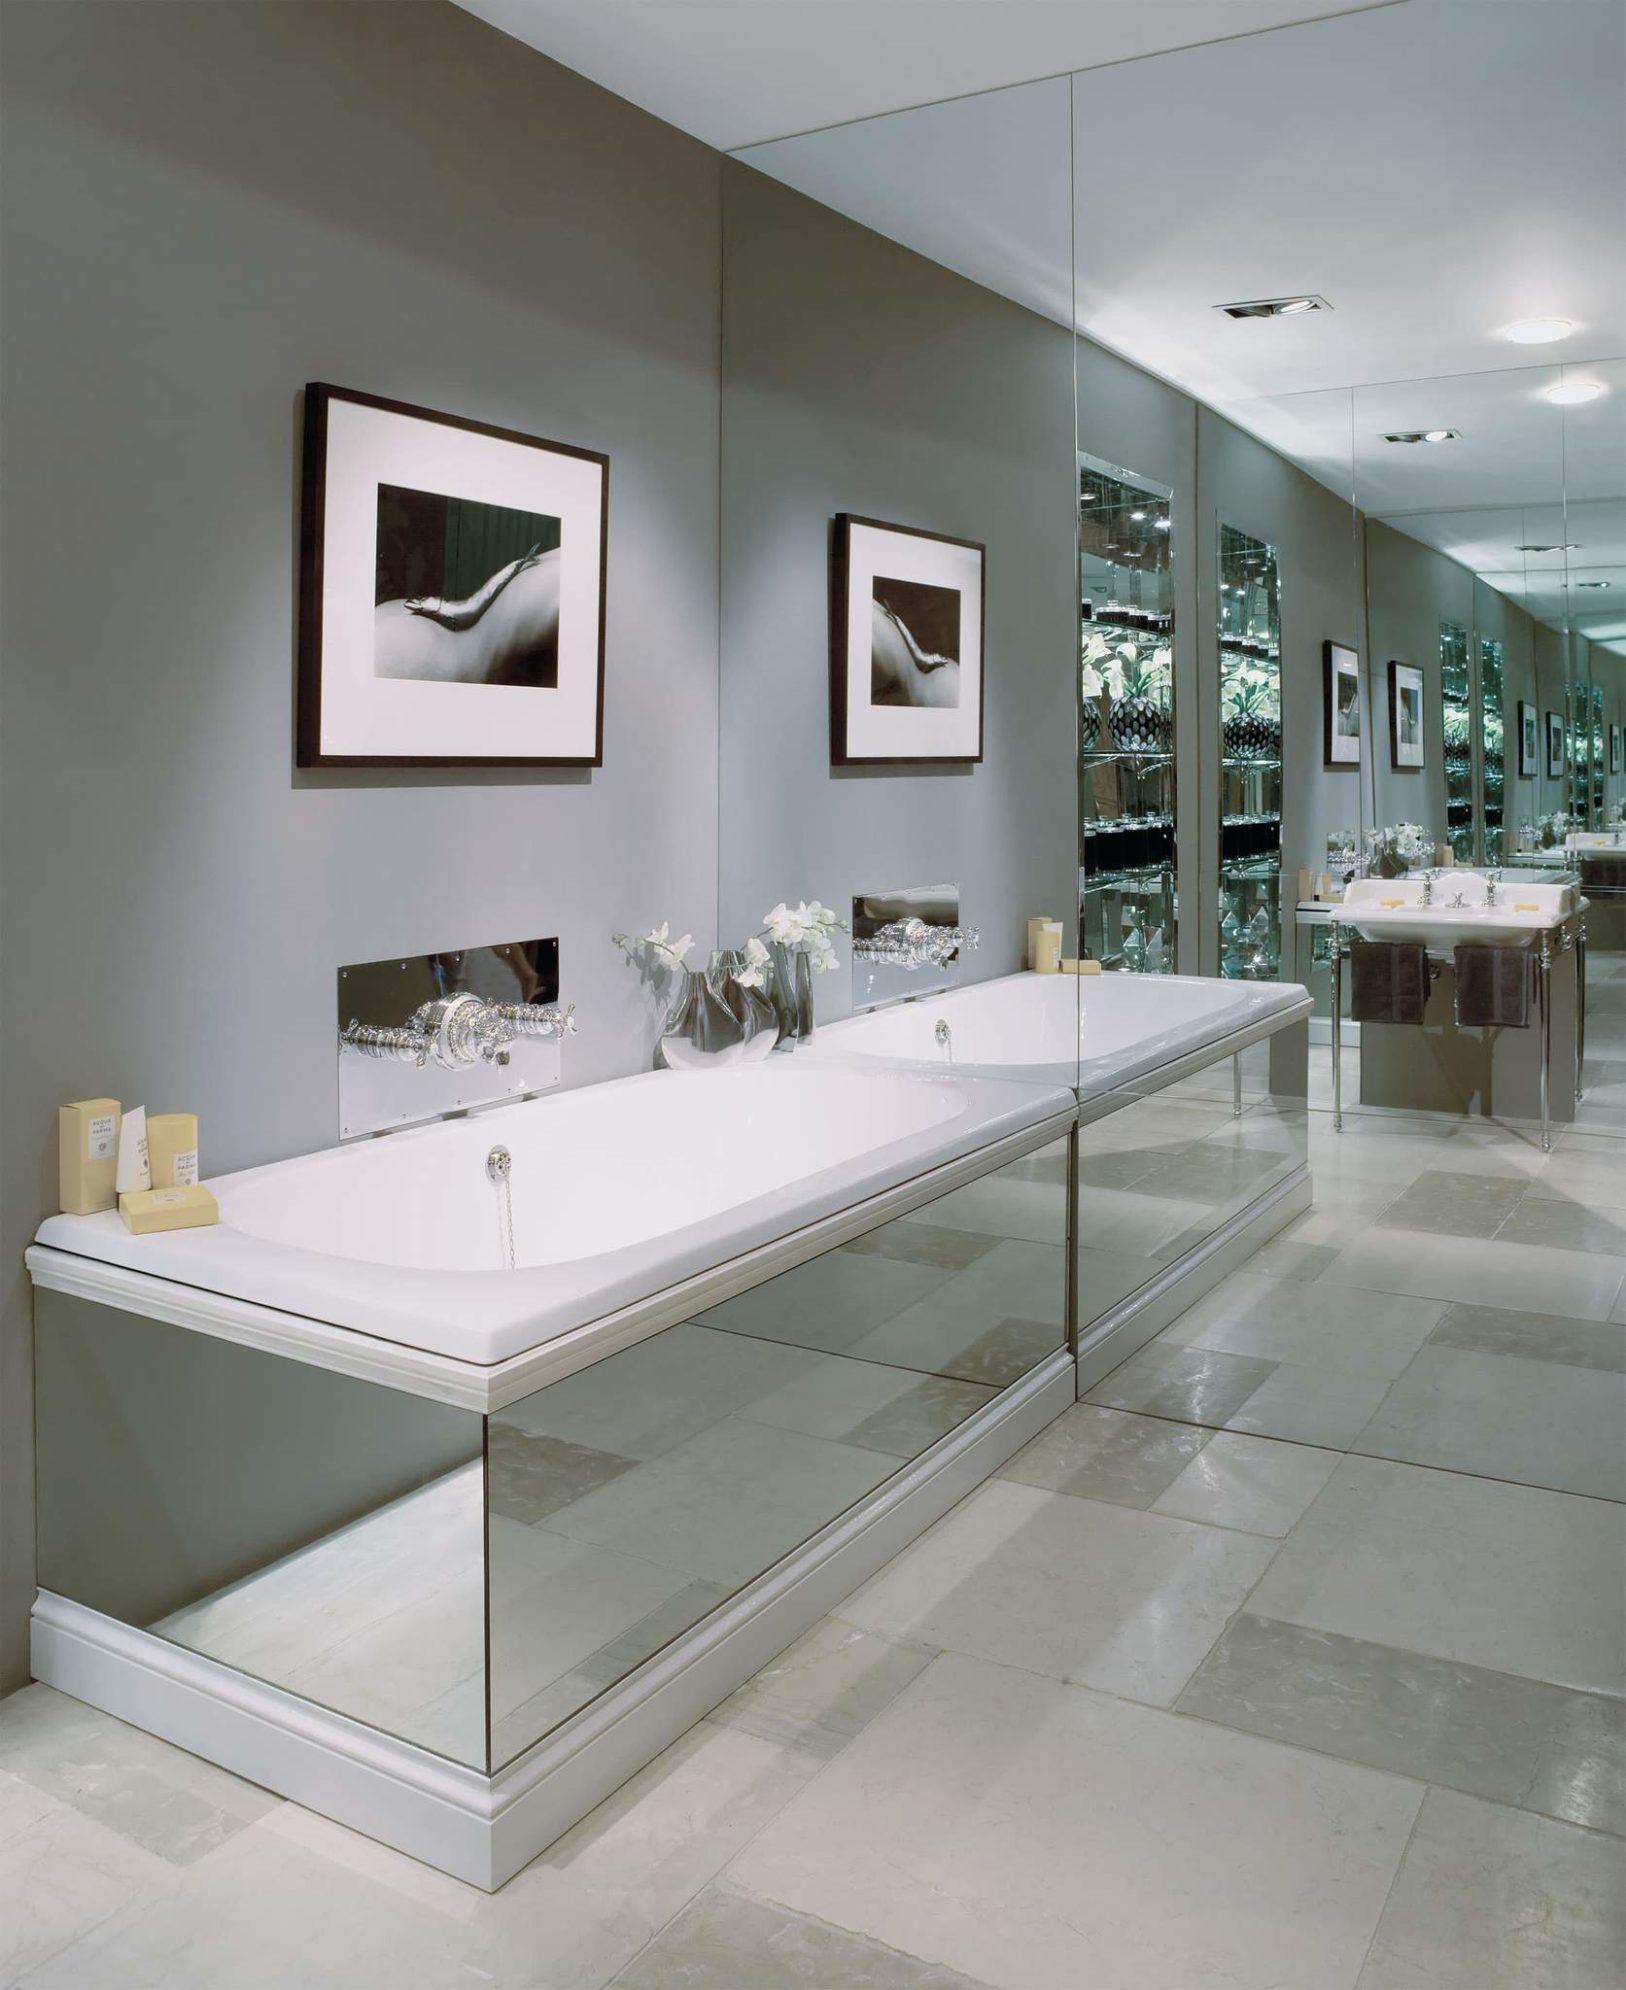 The Lomond Overmounted Cast Iron Built-In Bath Tub